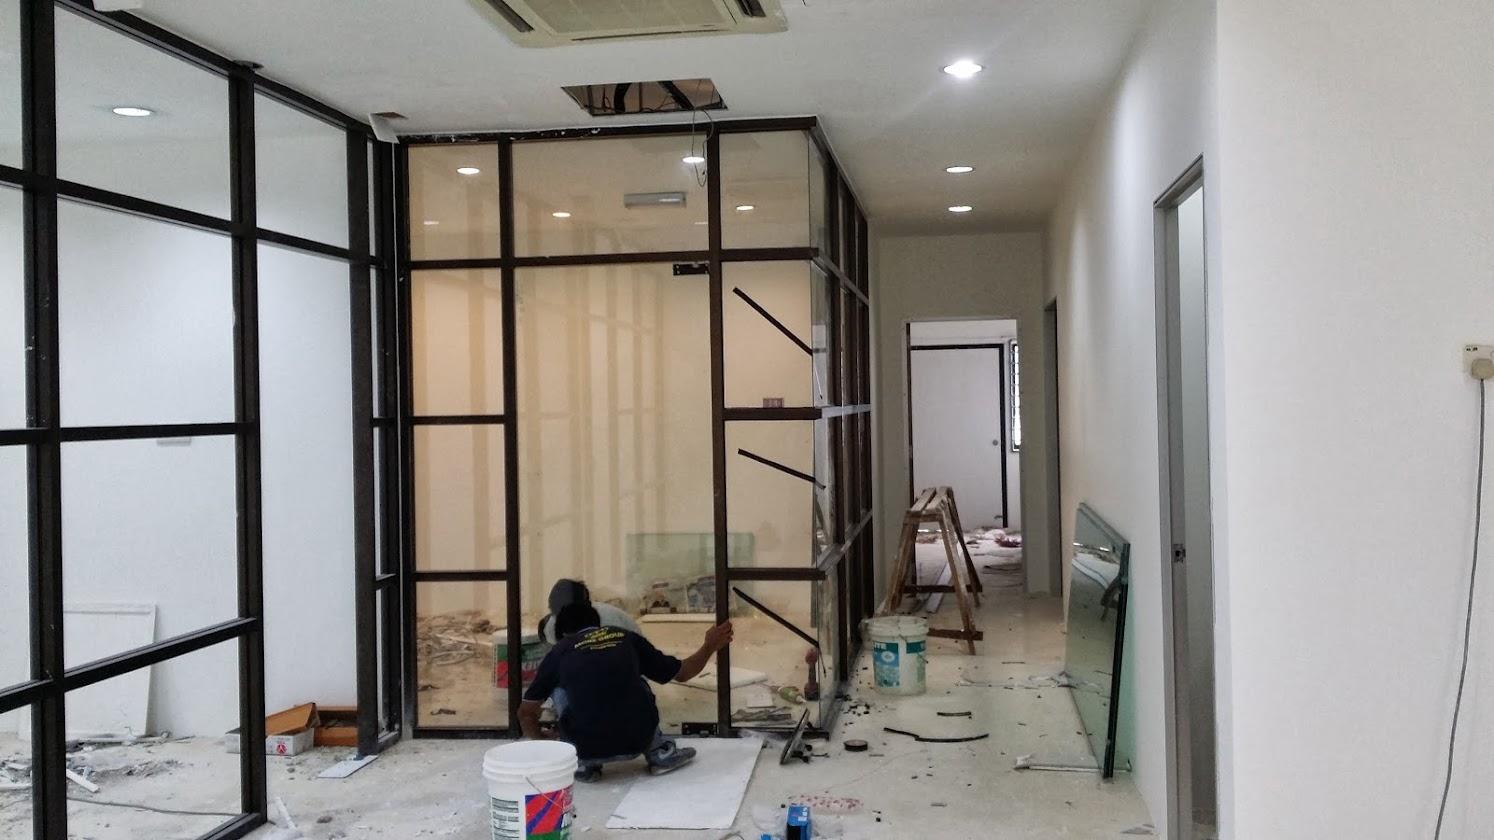 Installing glass panel